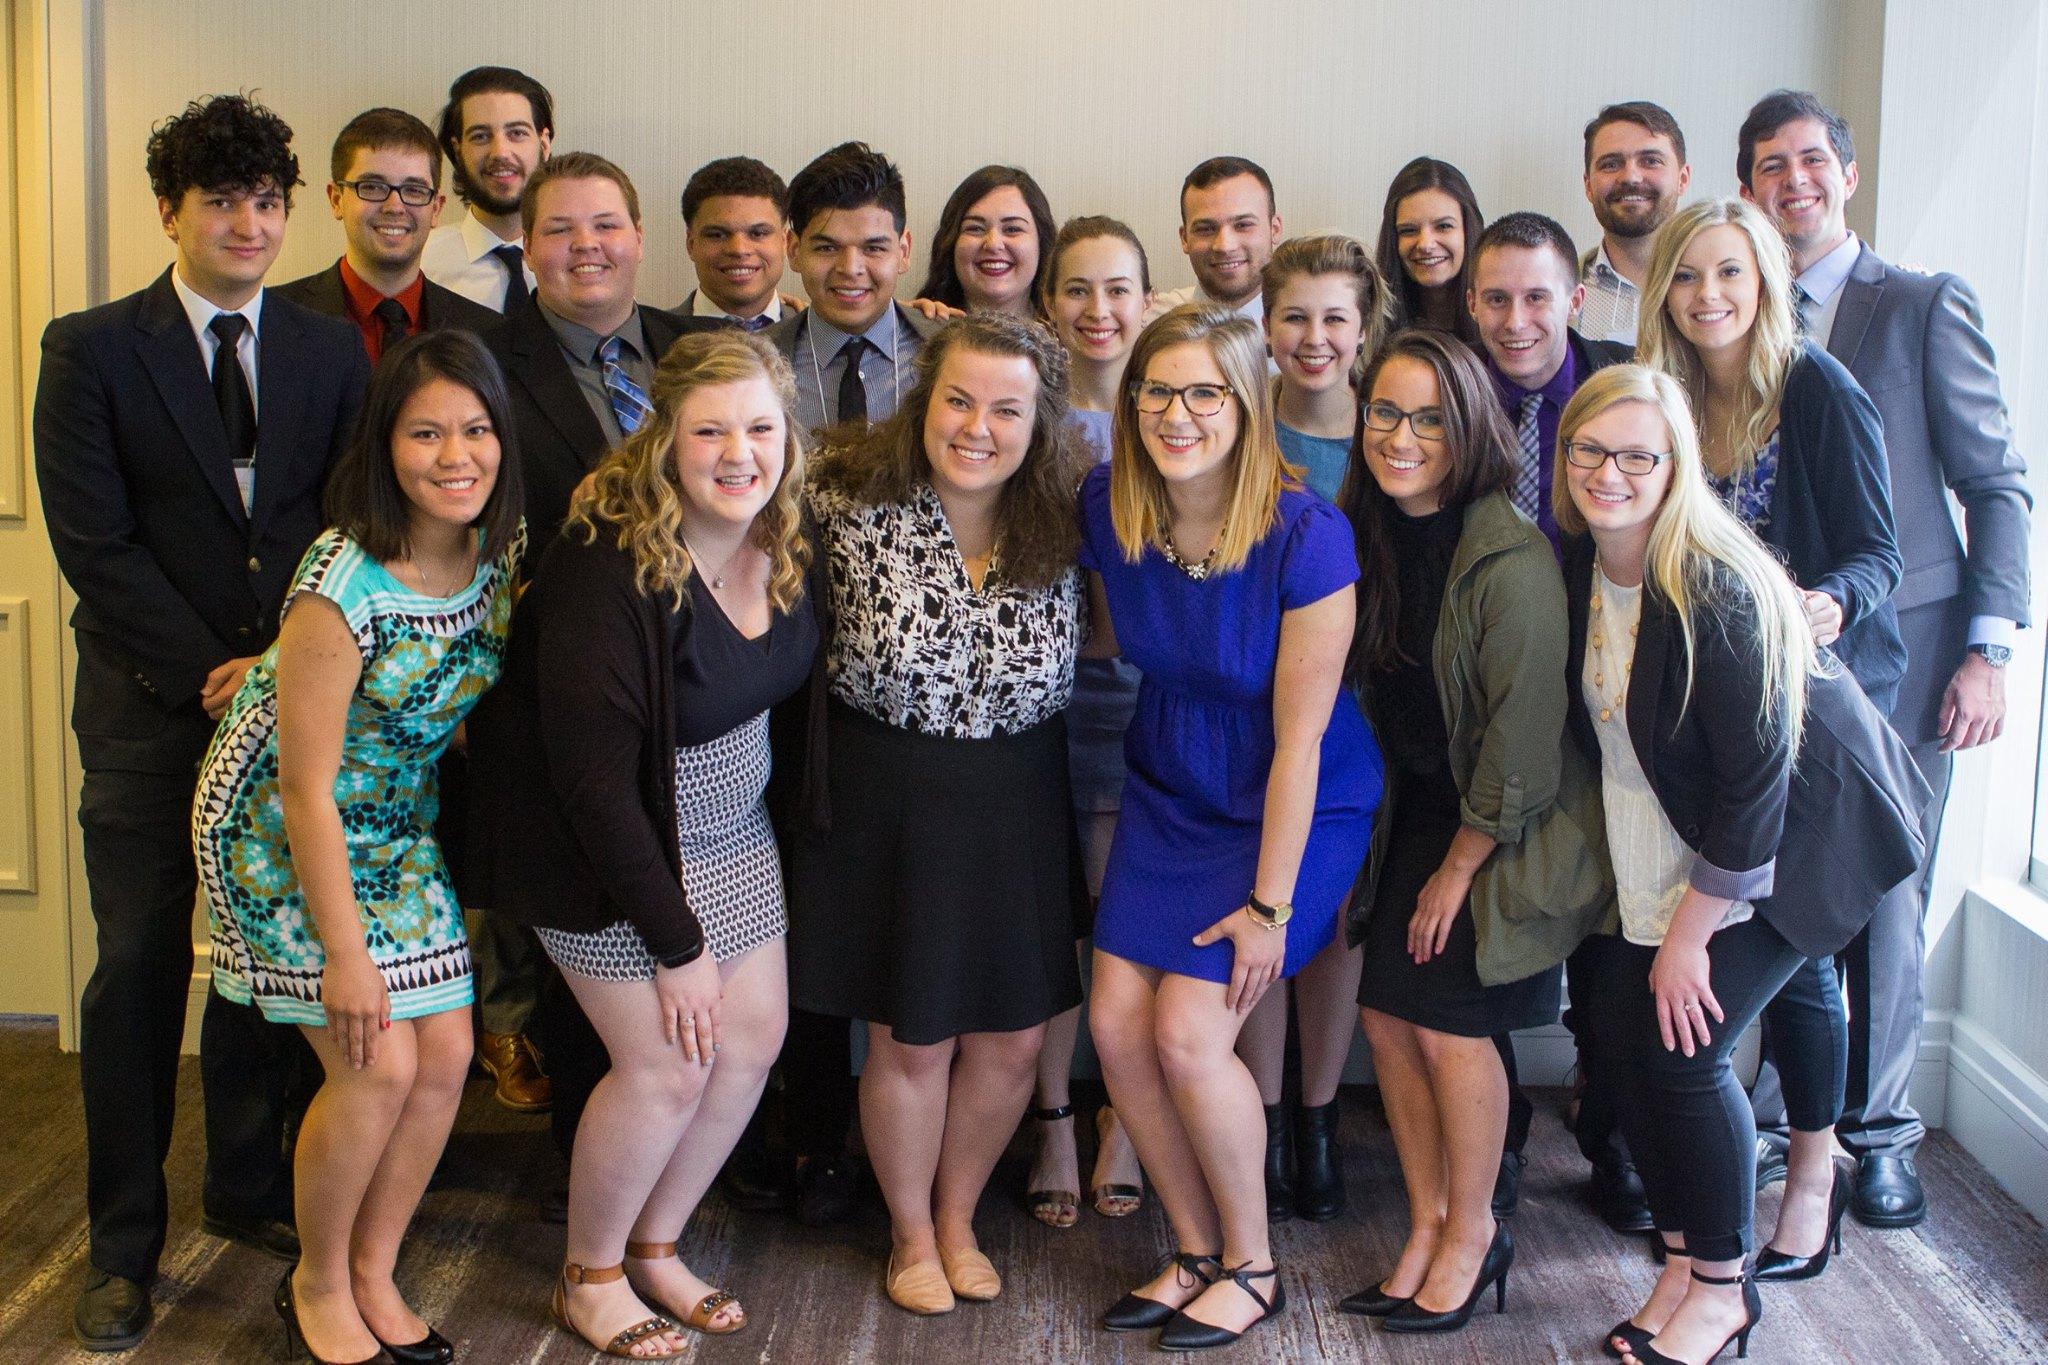 UNL 2016 NSAC team: links to news story